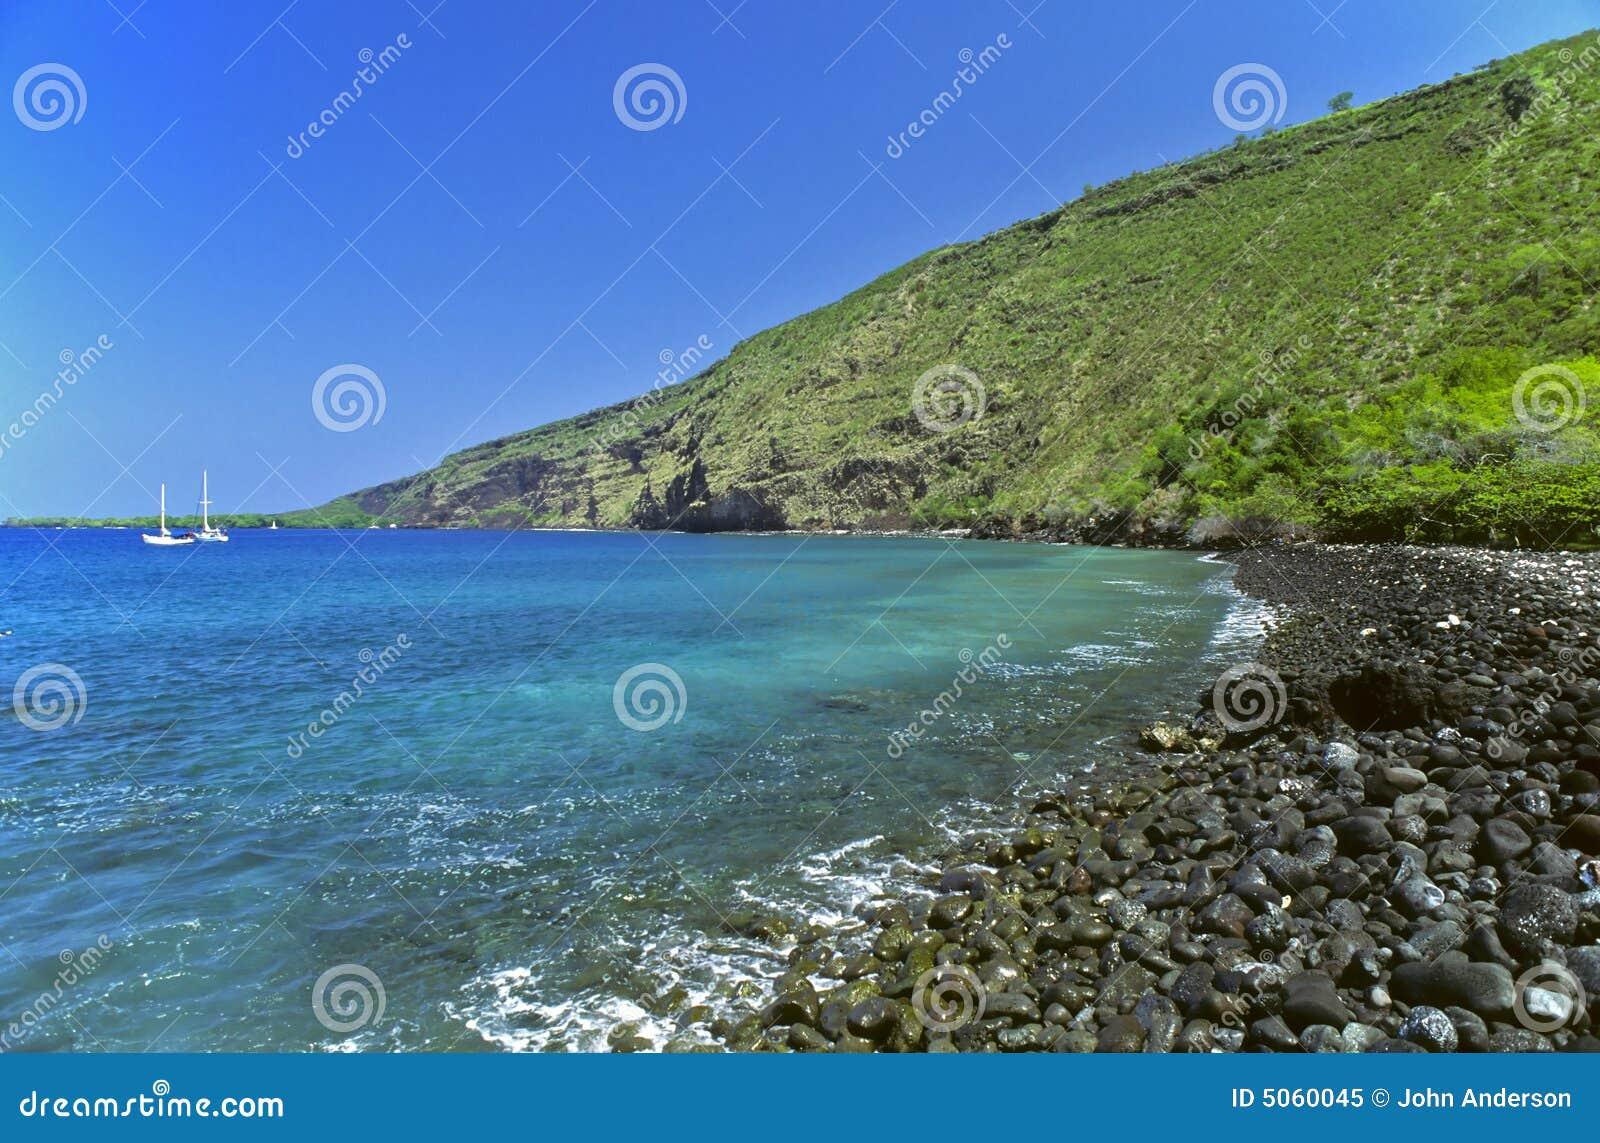 stock image of hawaiian - photo #46